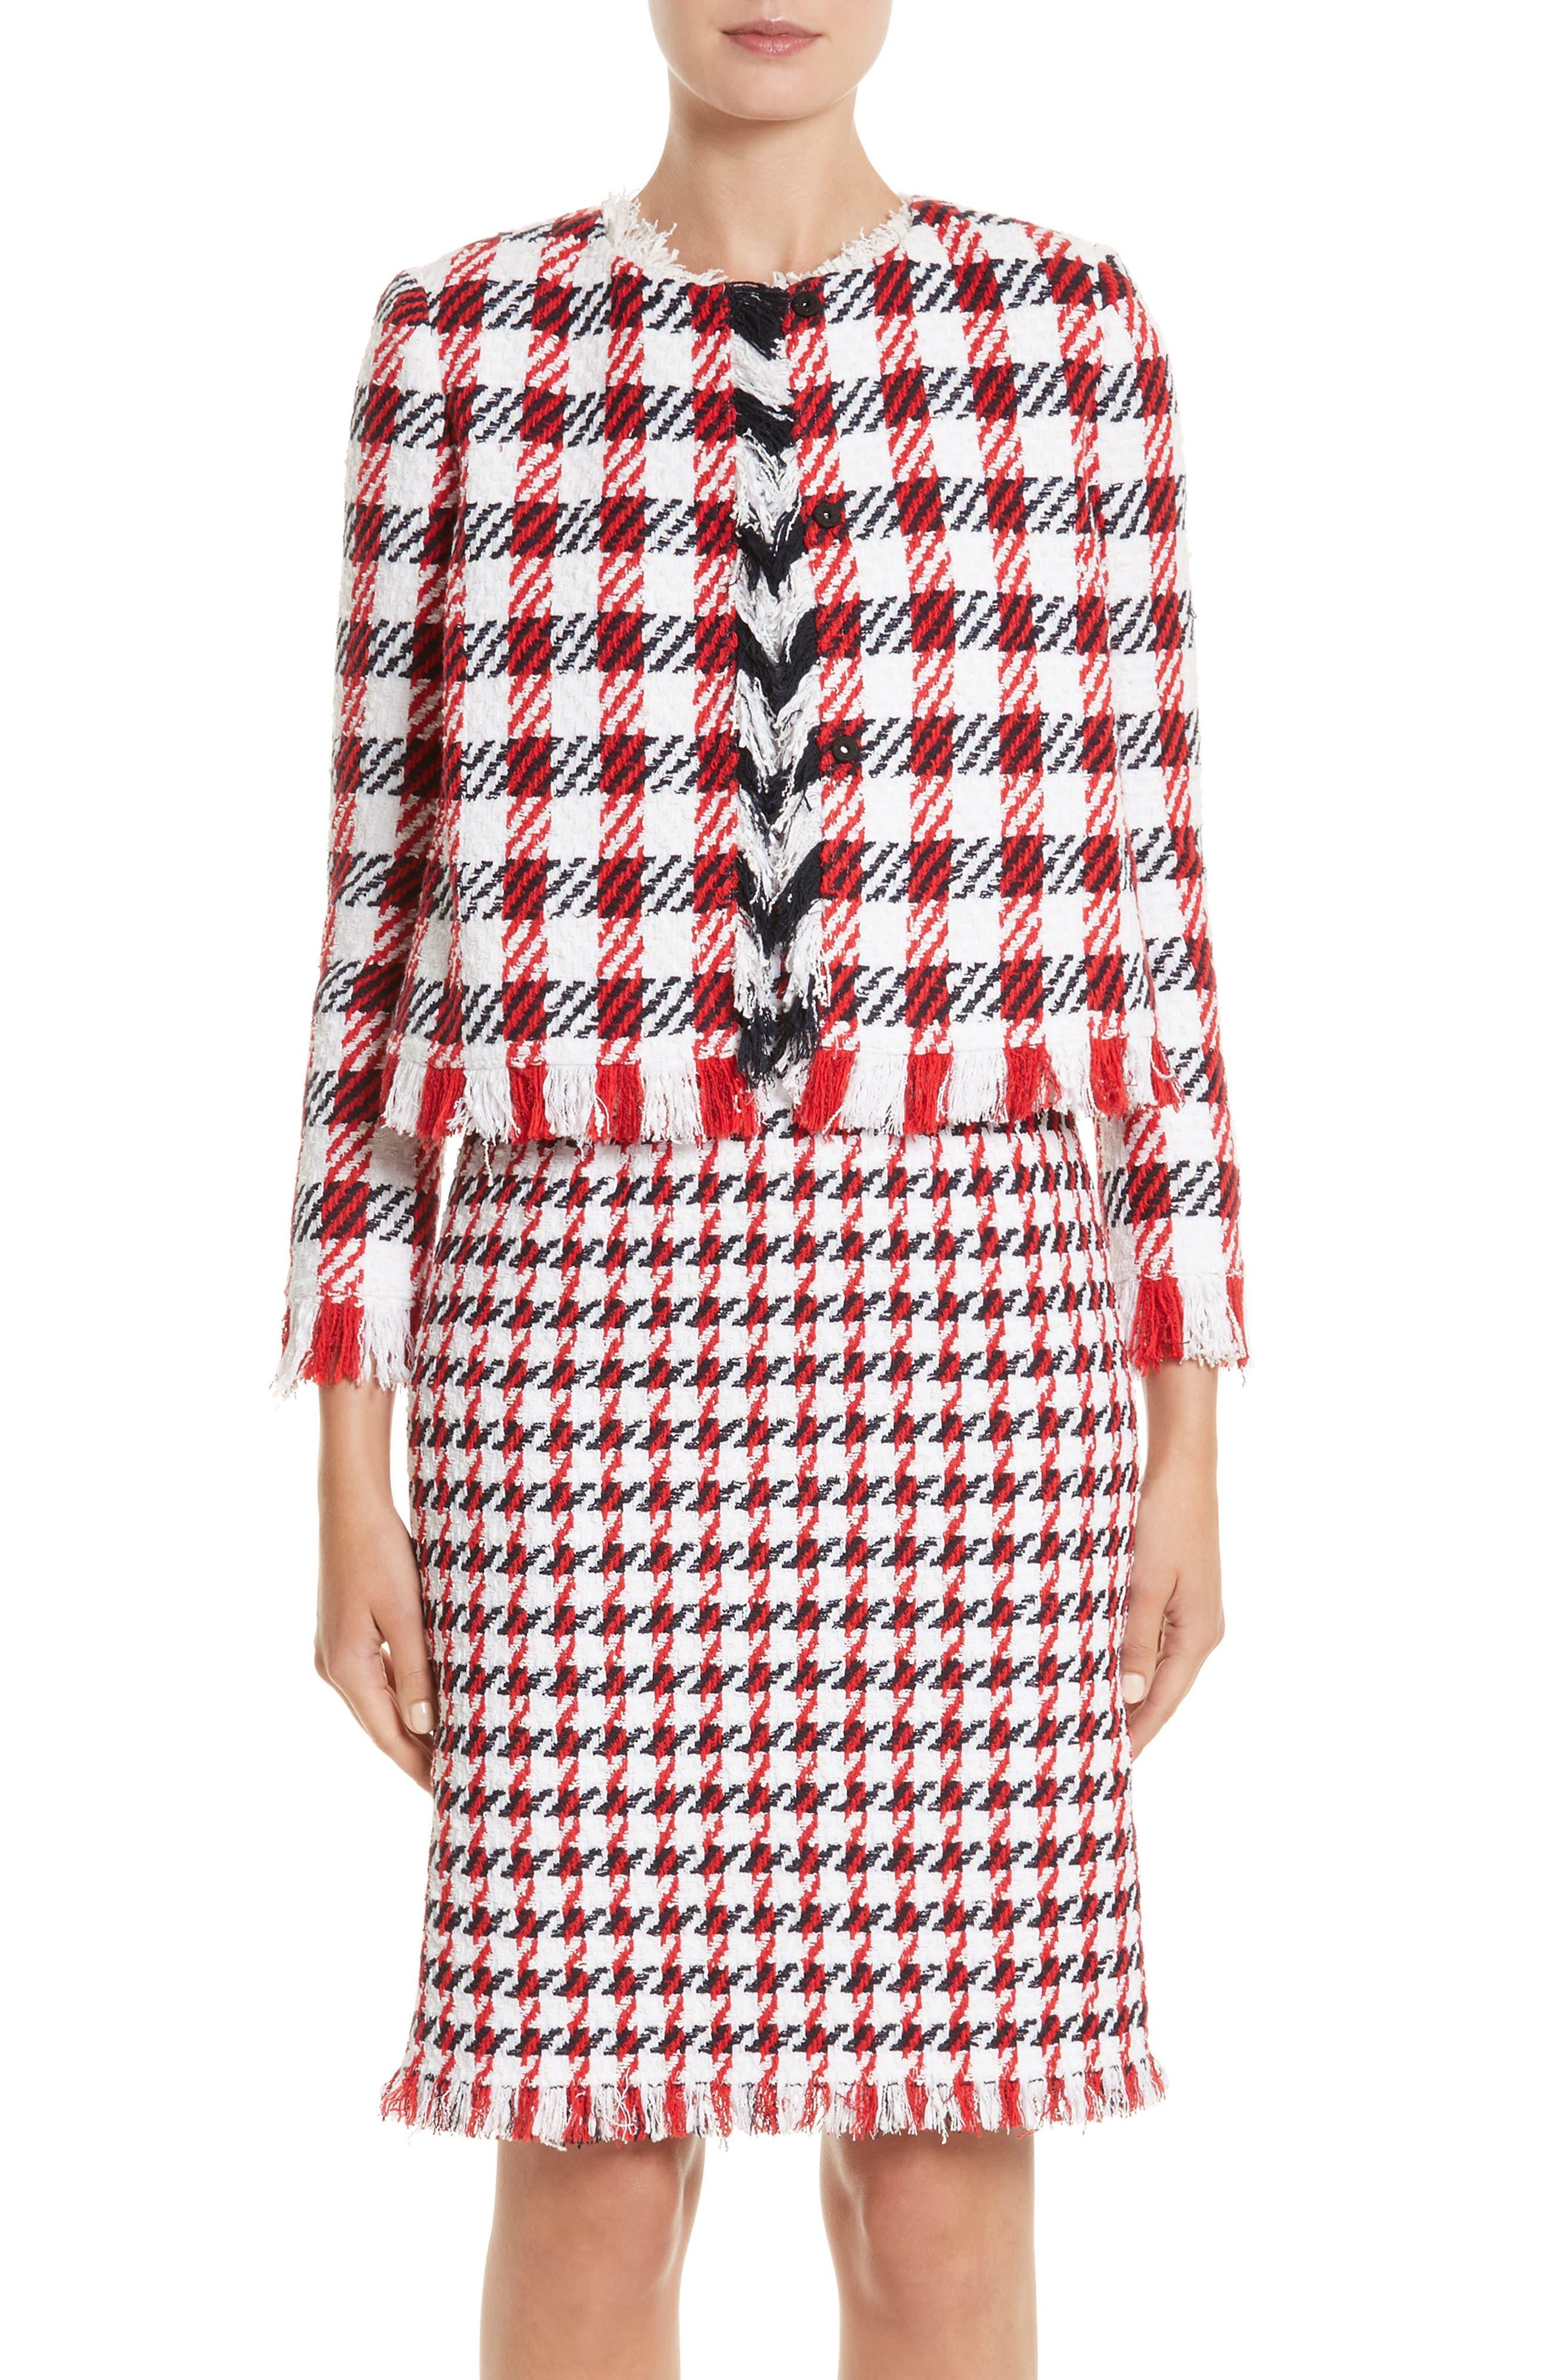 Alternate Image 1 Selected - Oscar de la Renta Houndstooth Tweed Jacket